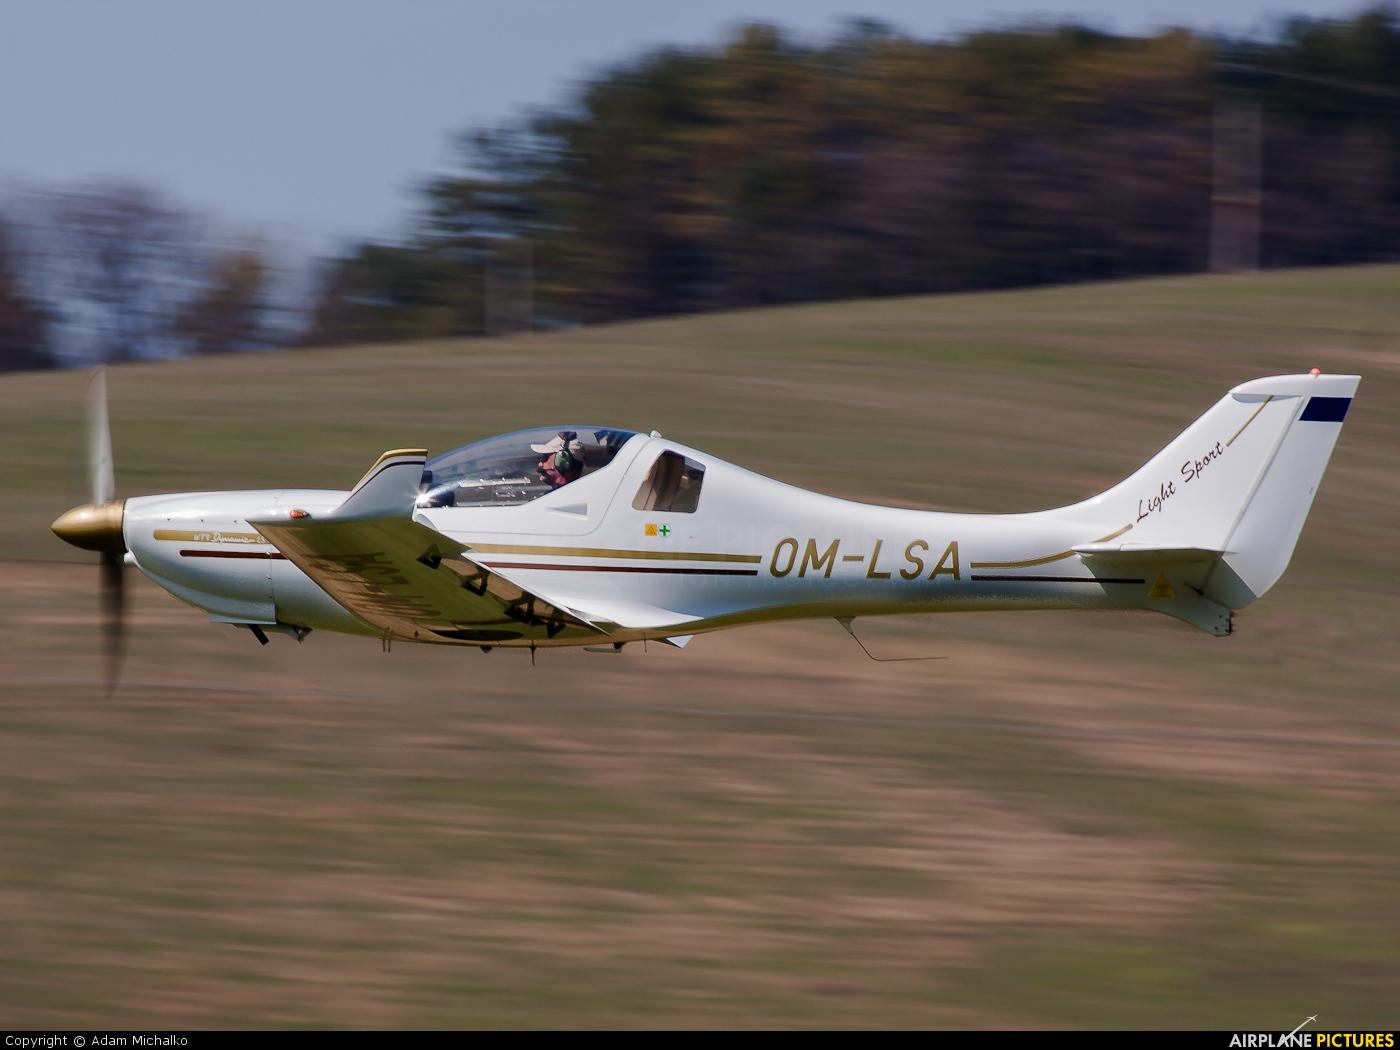 OM-LSA - Aerospool Aerospol WT9 Dynamic at Prievidza ...